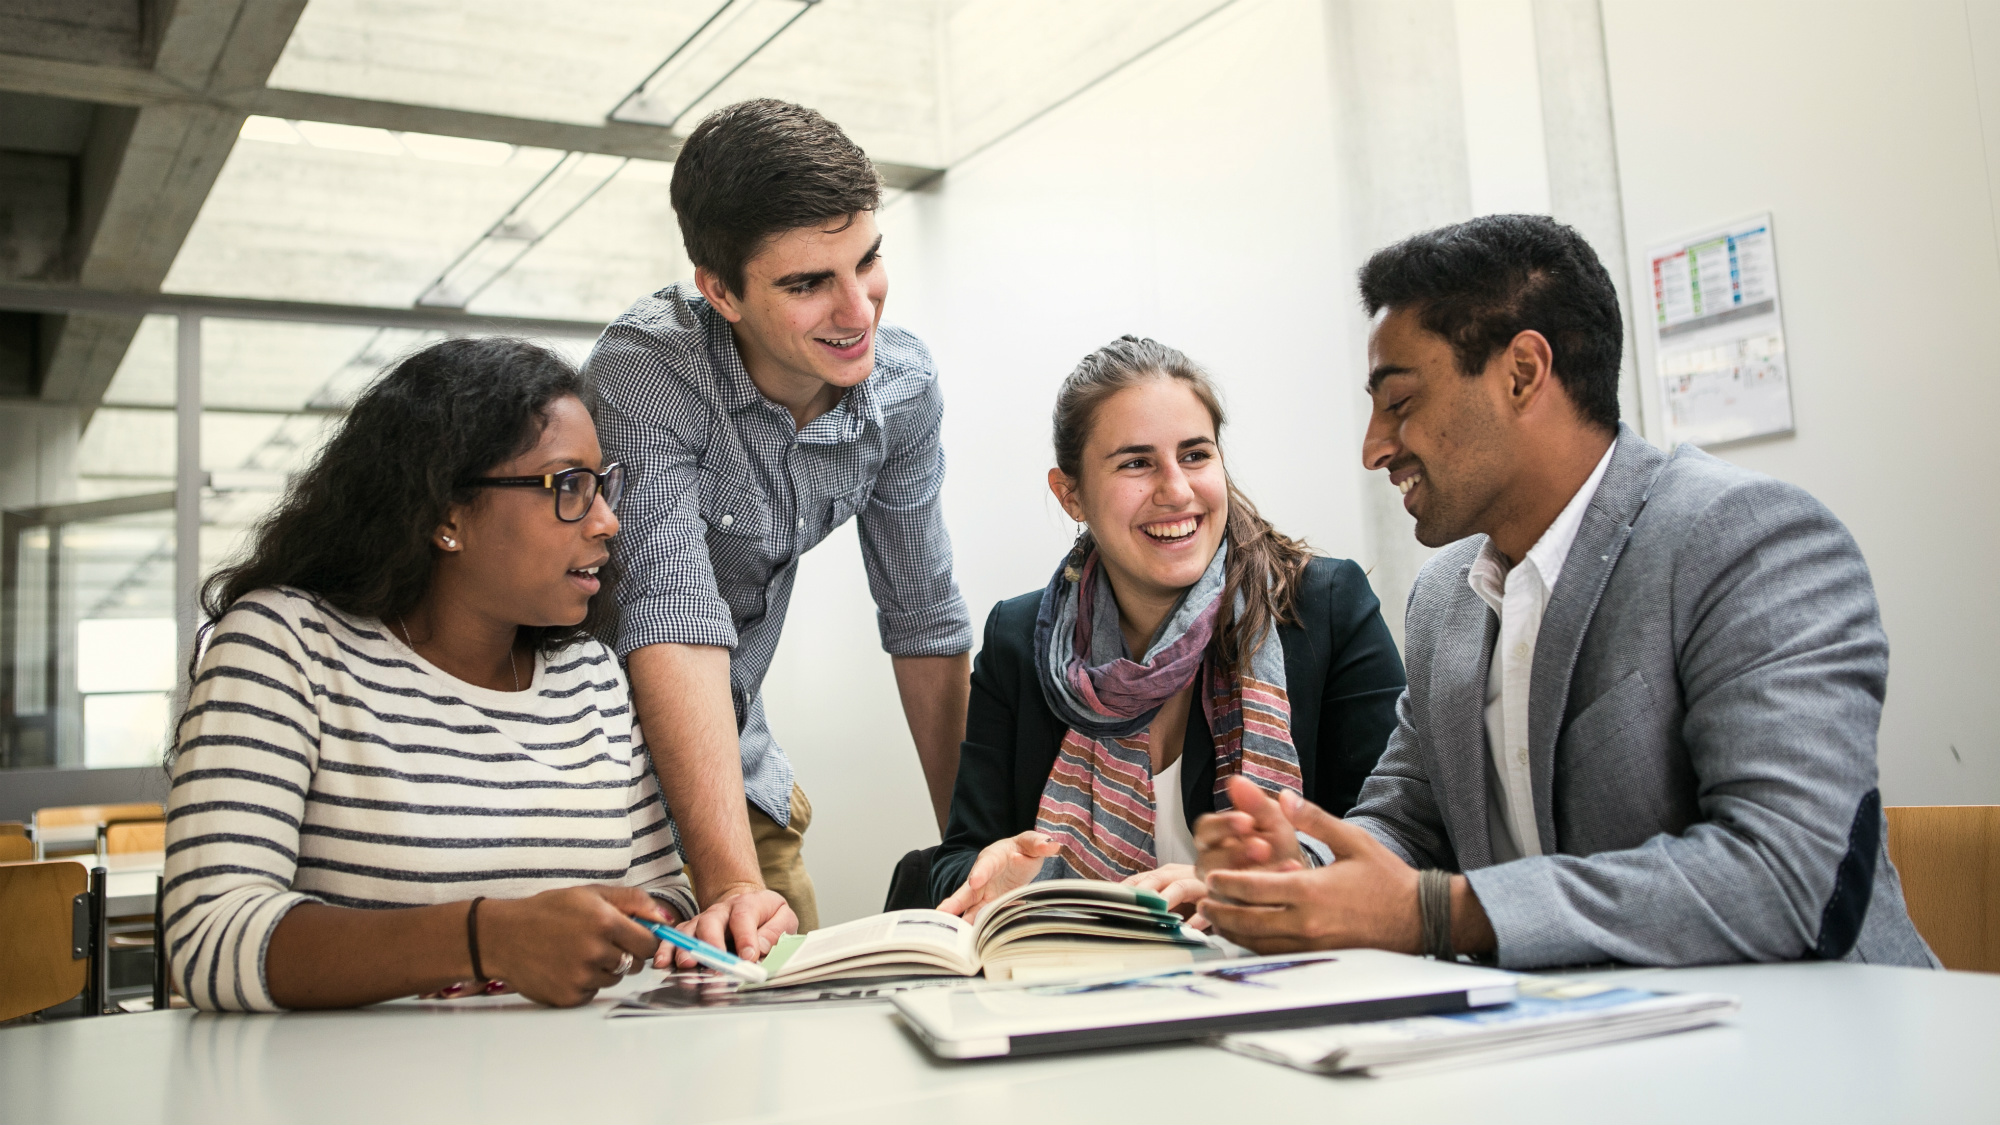 Studiernde bei Gruppenarbeit